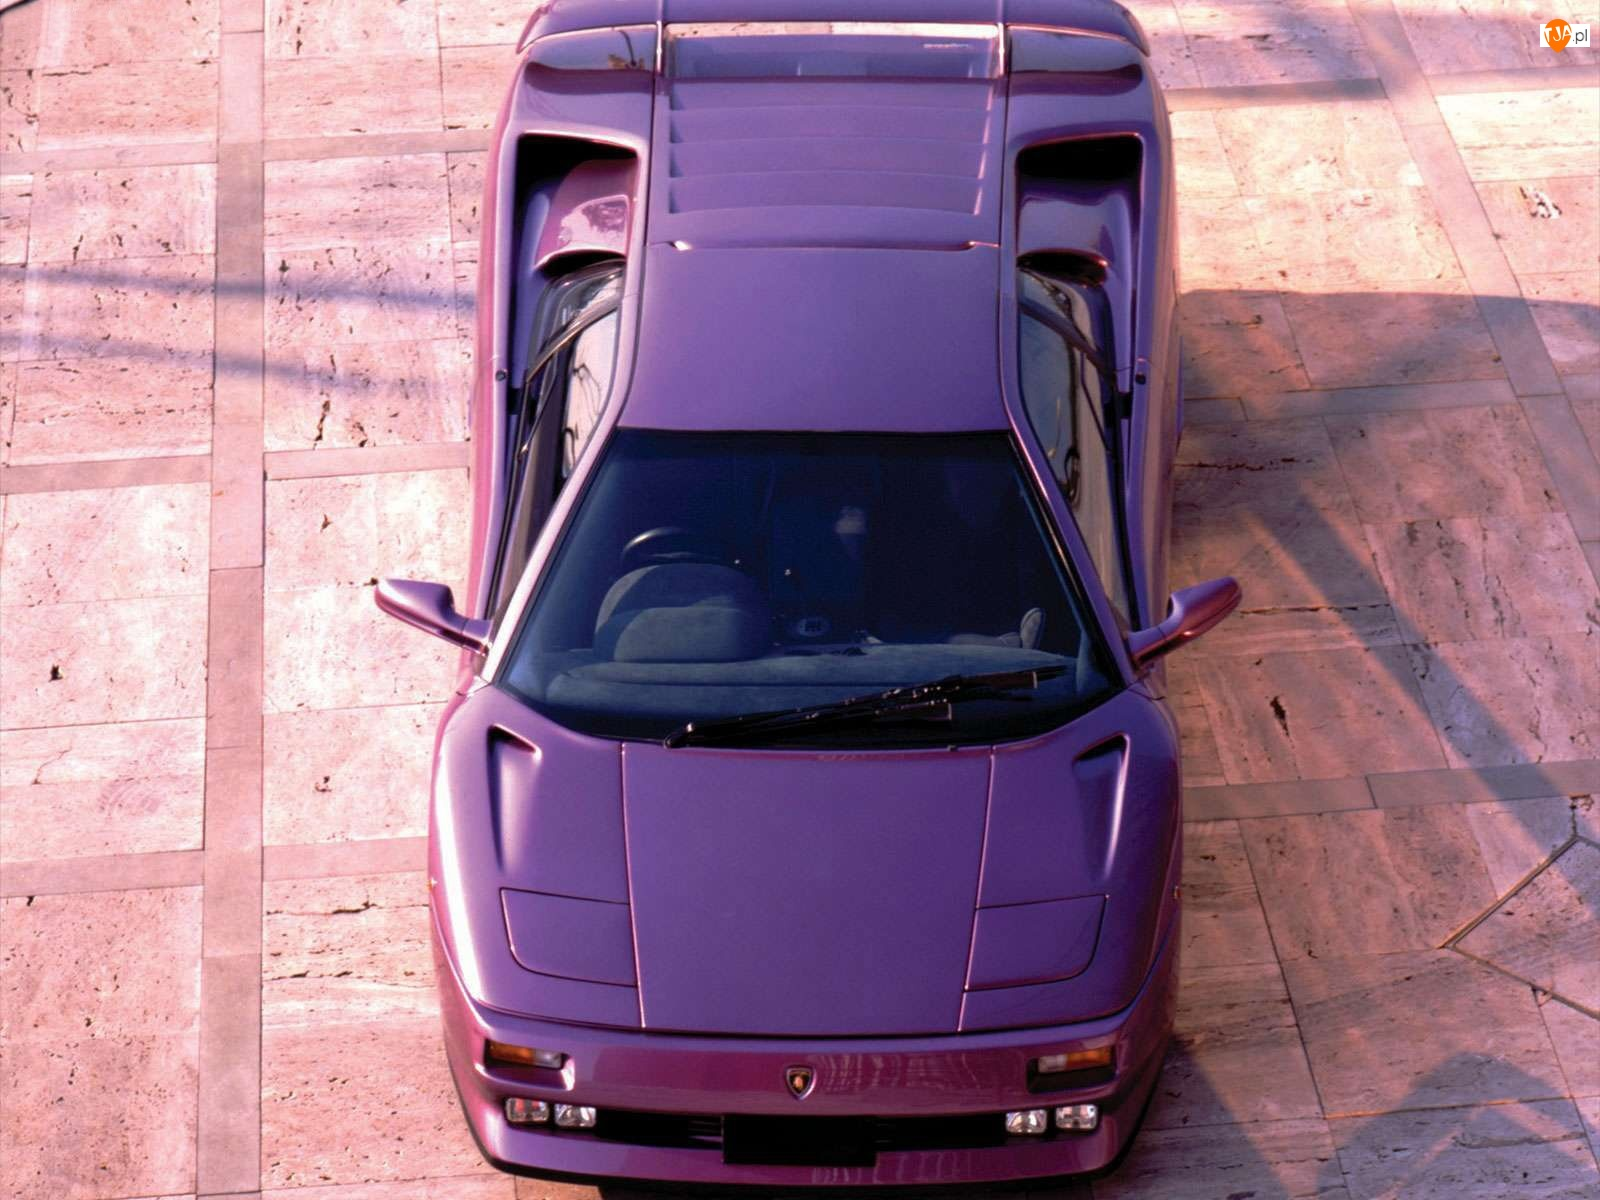 Lampy, Lamborghini Diablo, Podnoszone